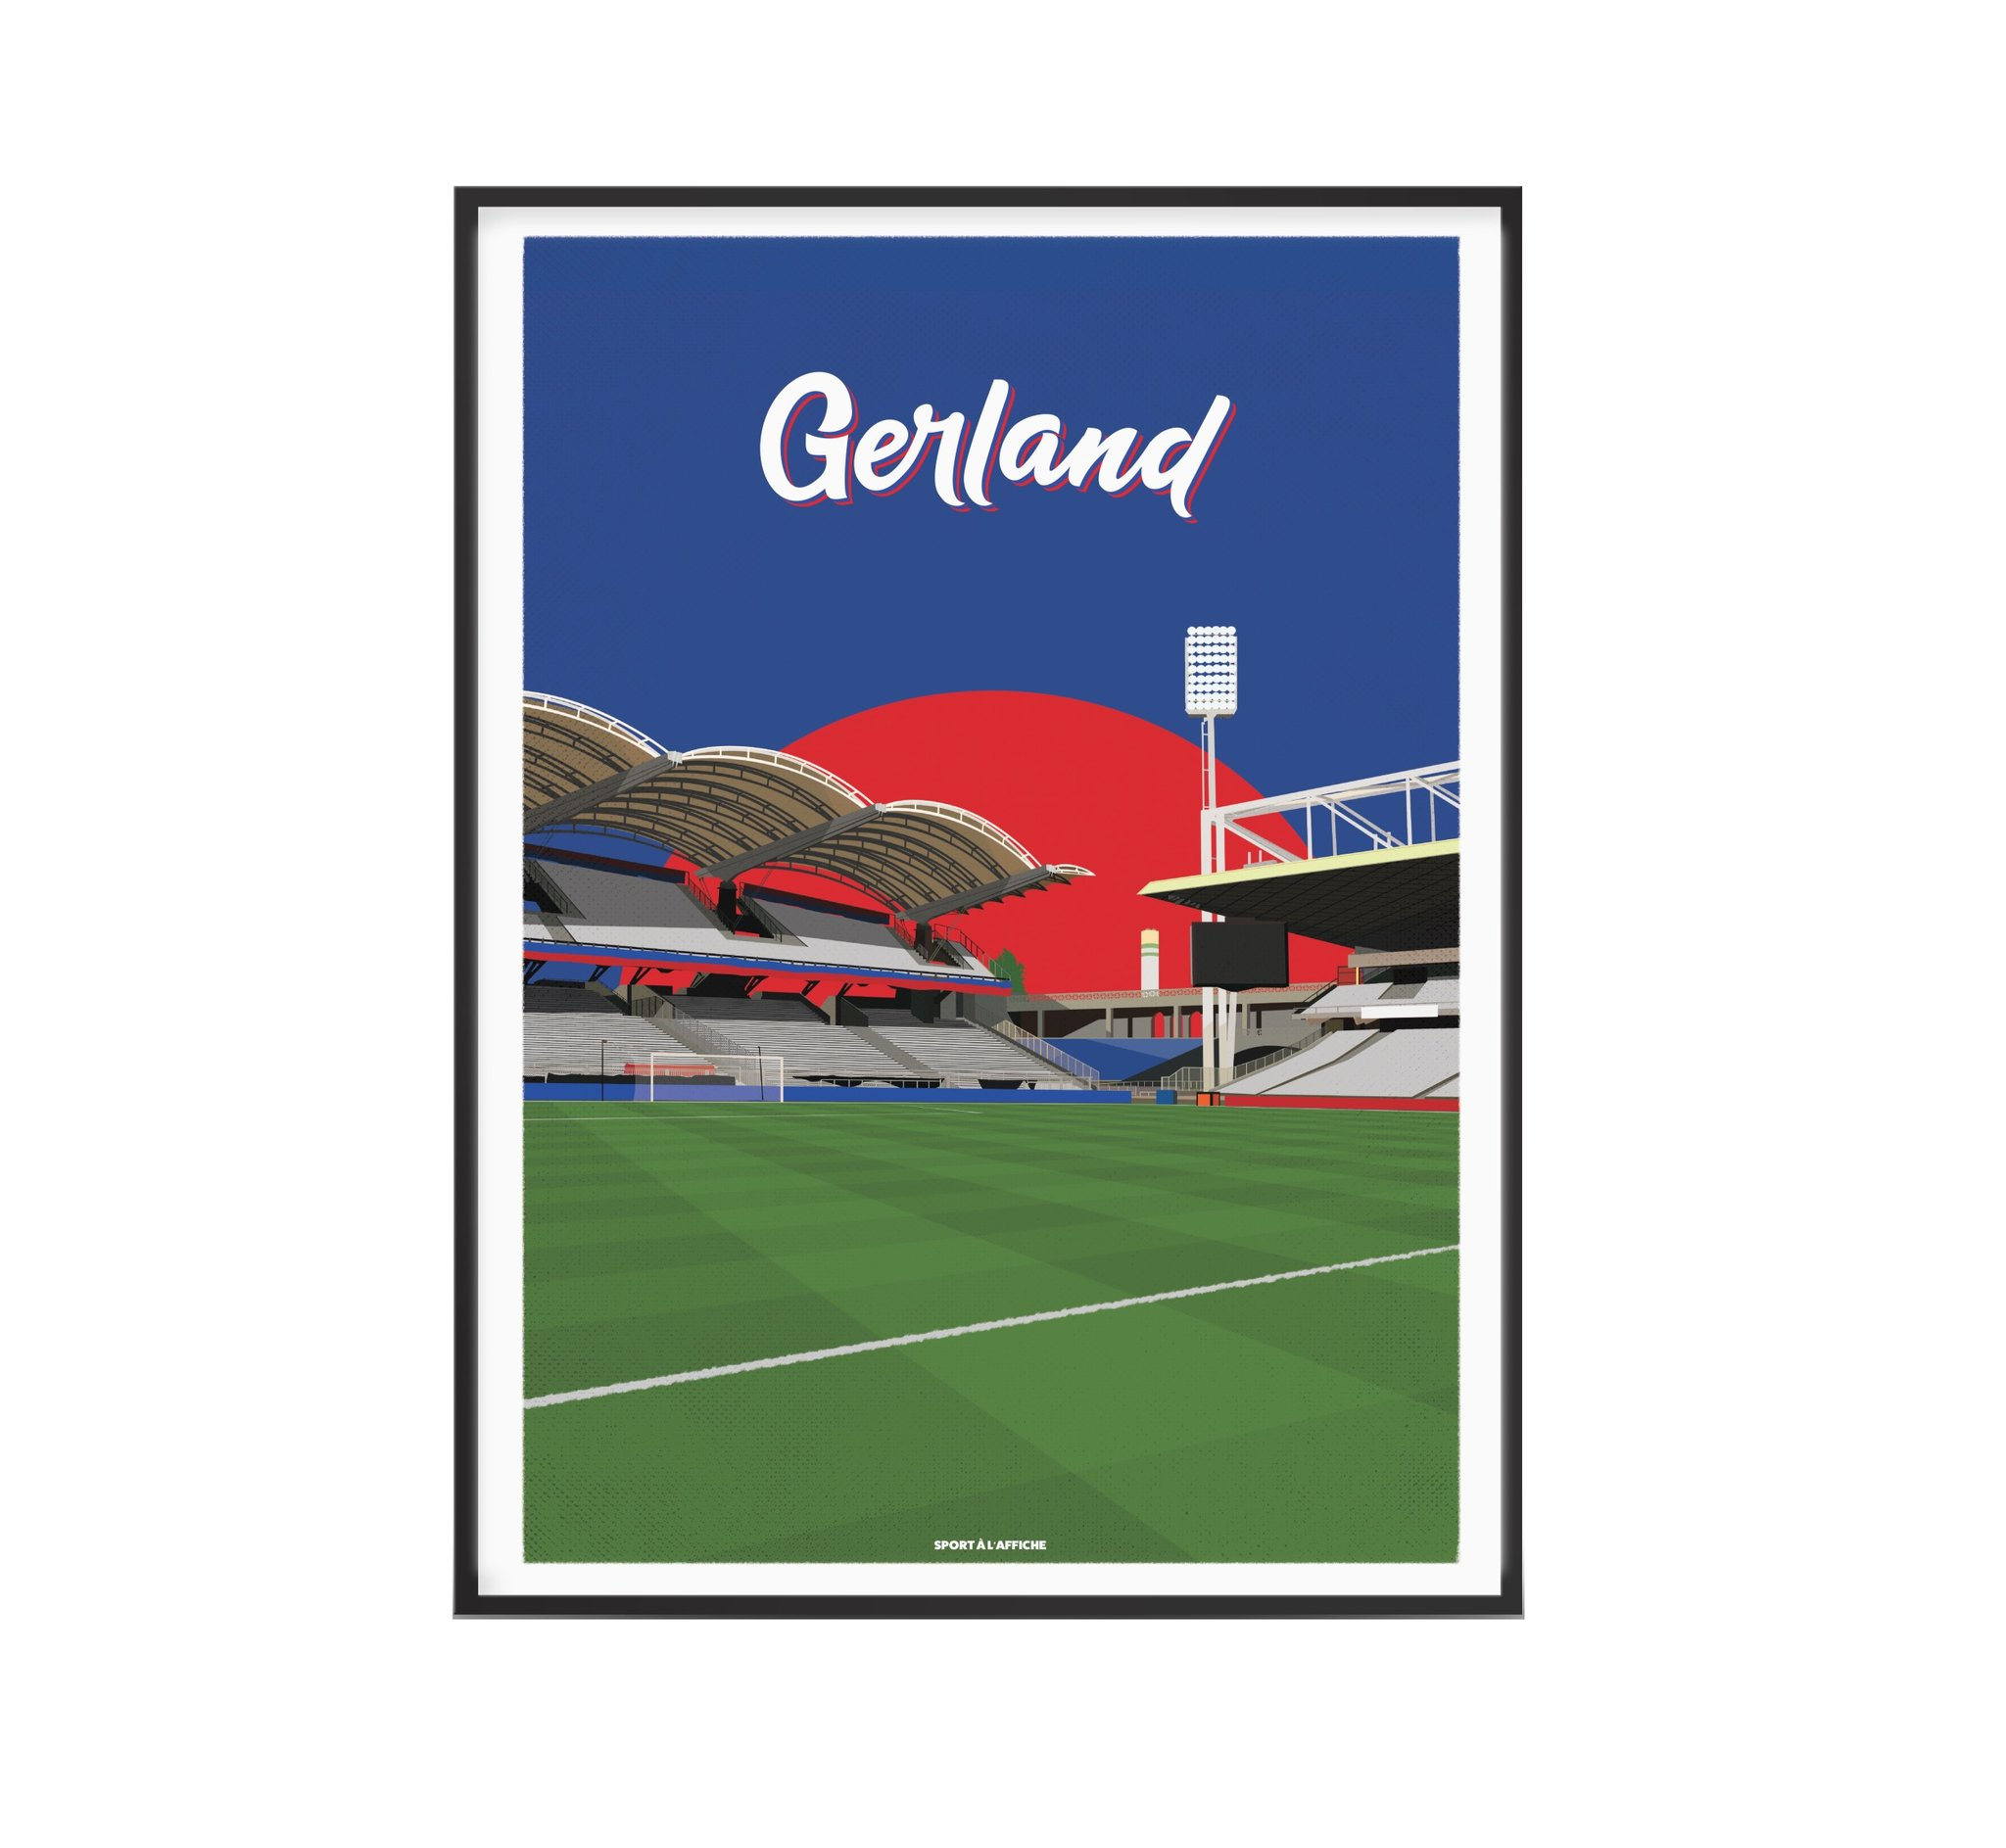 Affiche stade Gerland Lyon 40x60 cm